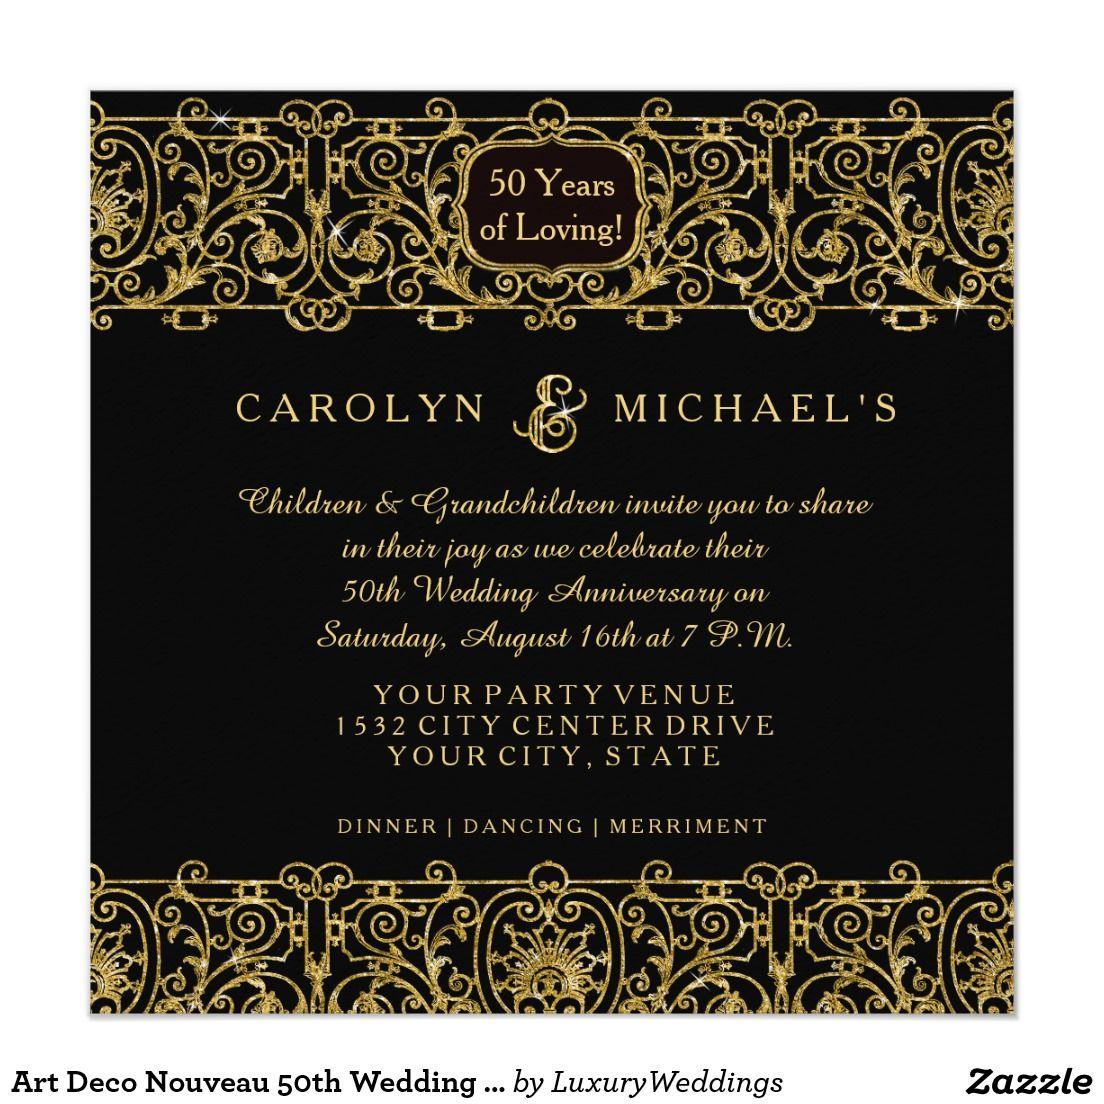 Art Deco Nouveau 50th Wedding Anniversary Party Card Anniversary